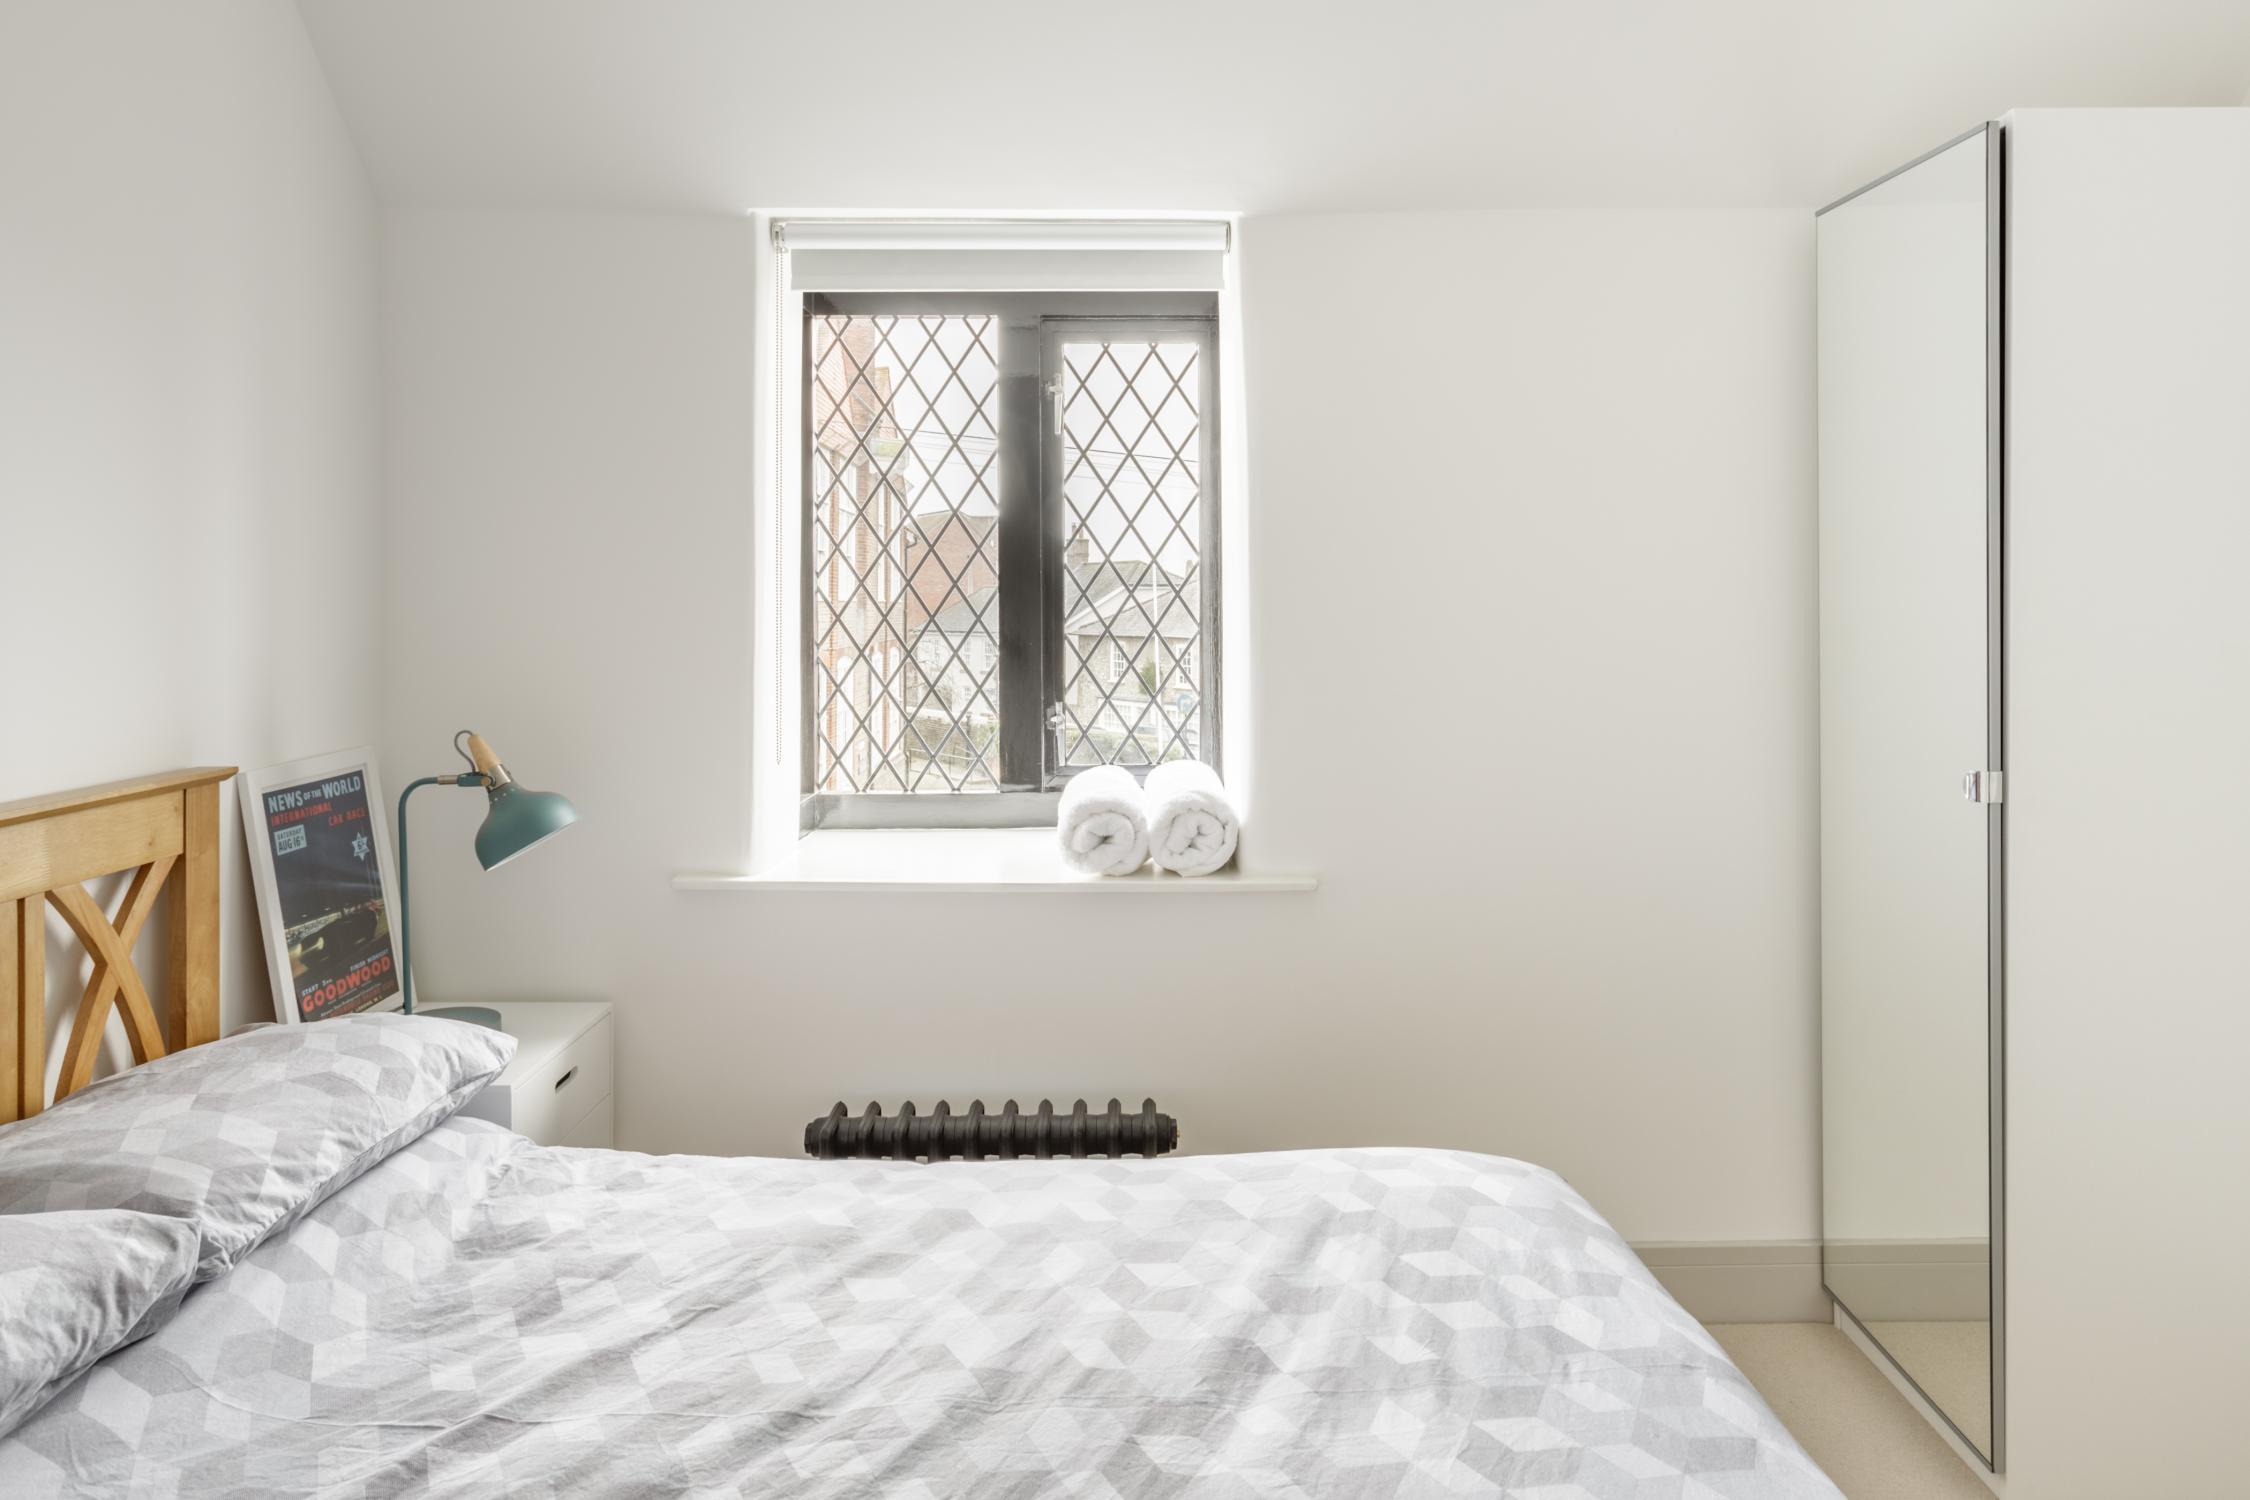 Worthing Builders-ExtraOrdinaryRooms-Arundel renovation conservation window.jpg